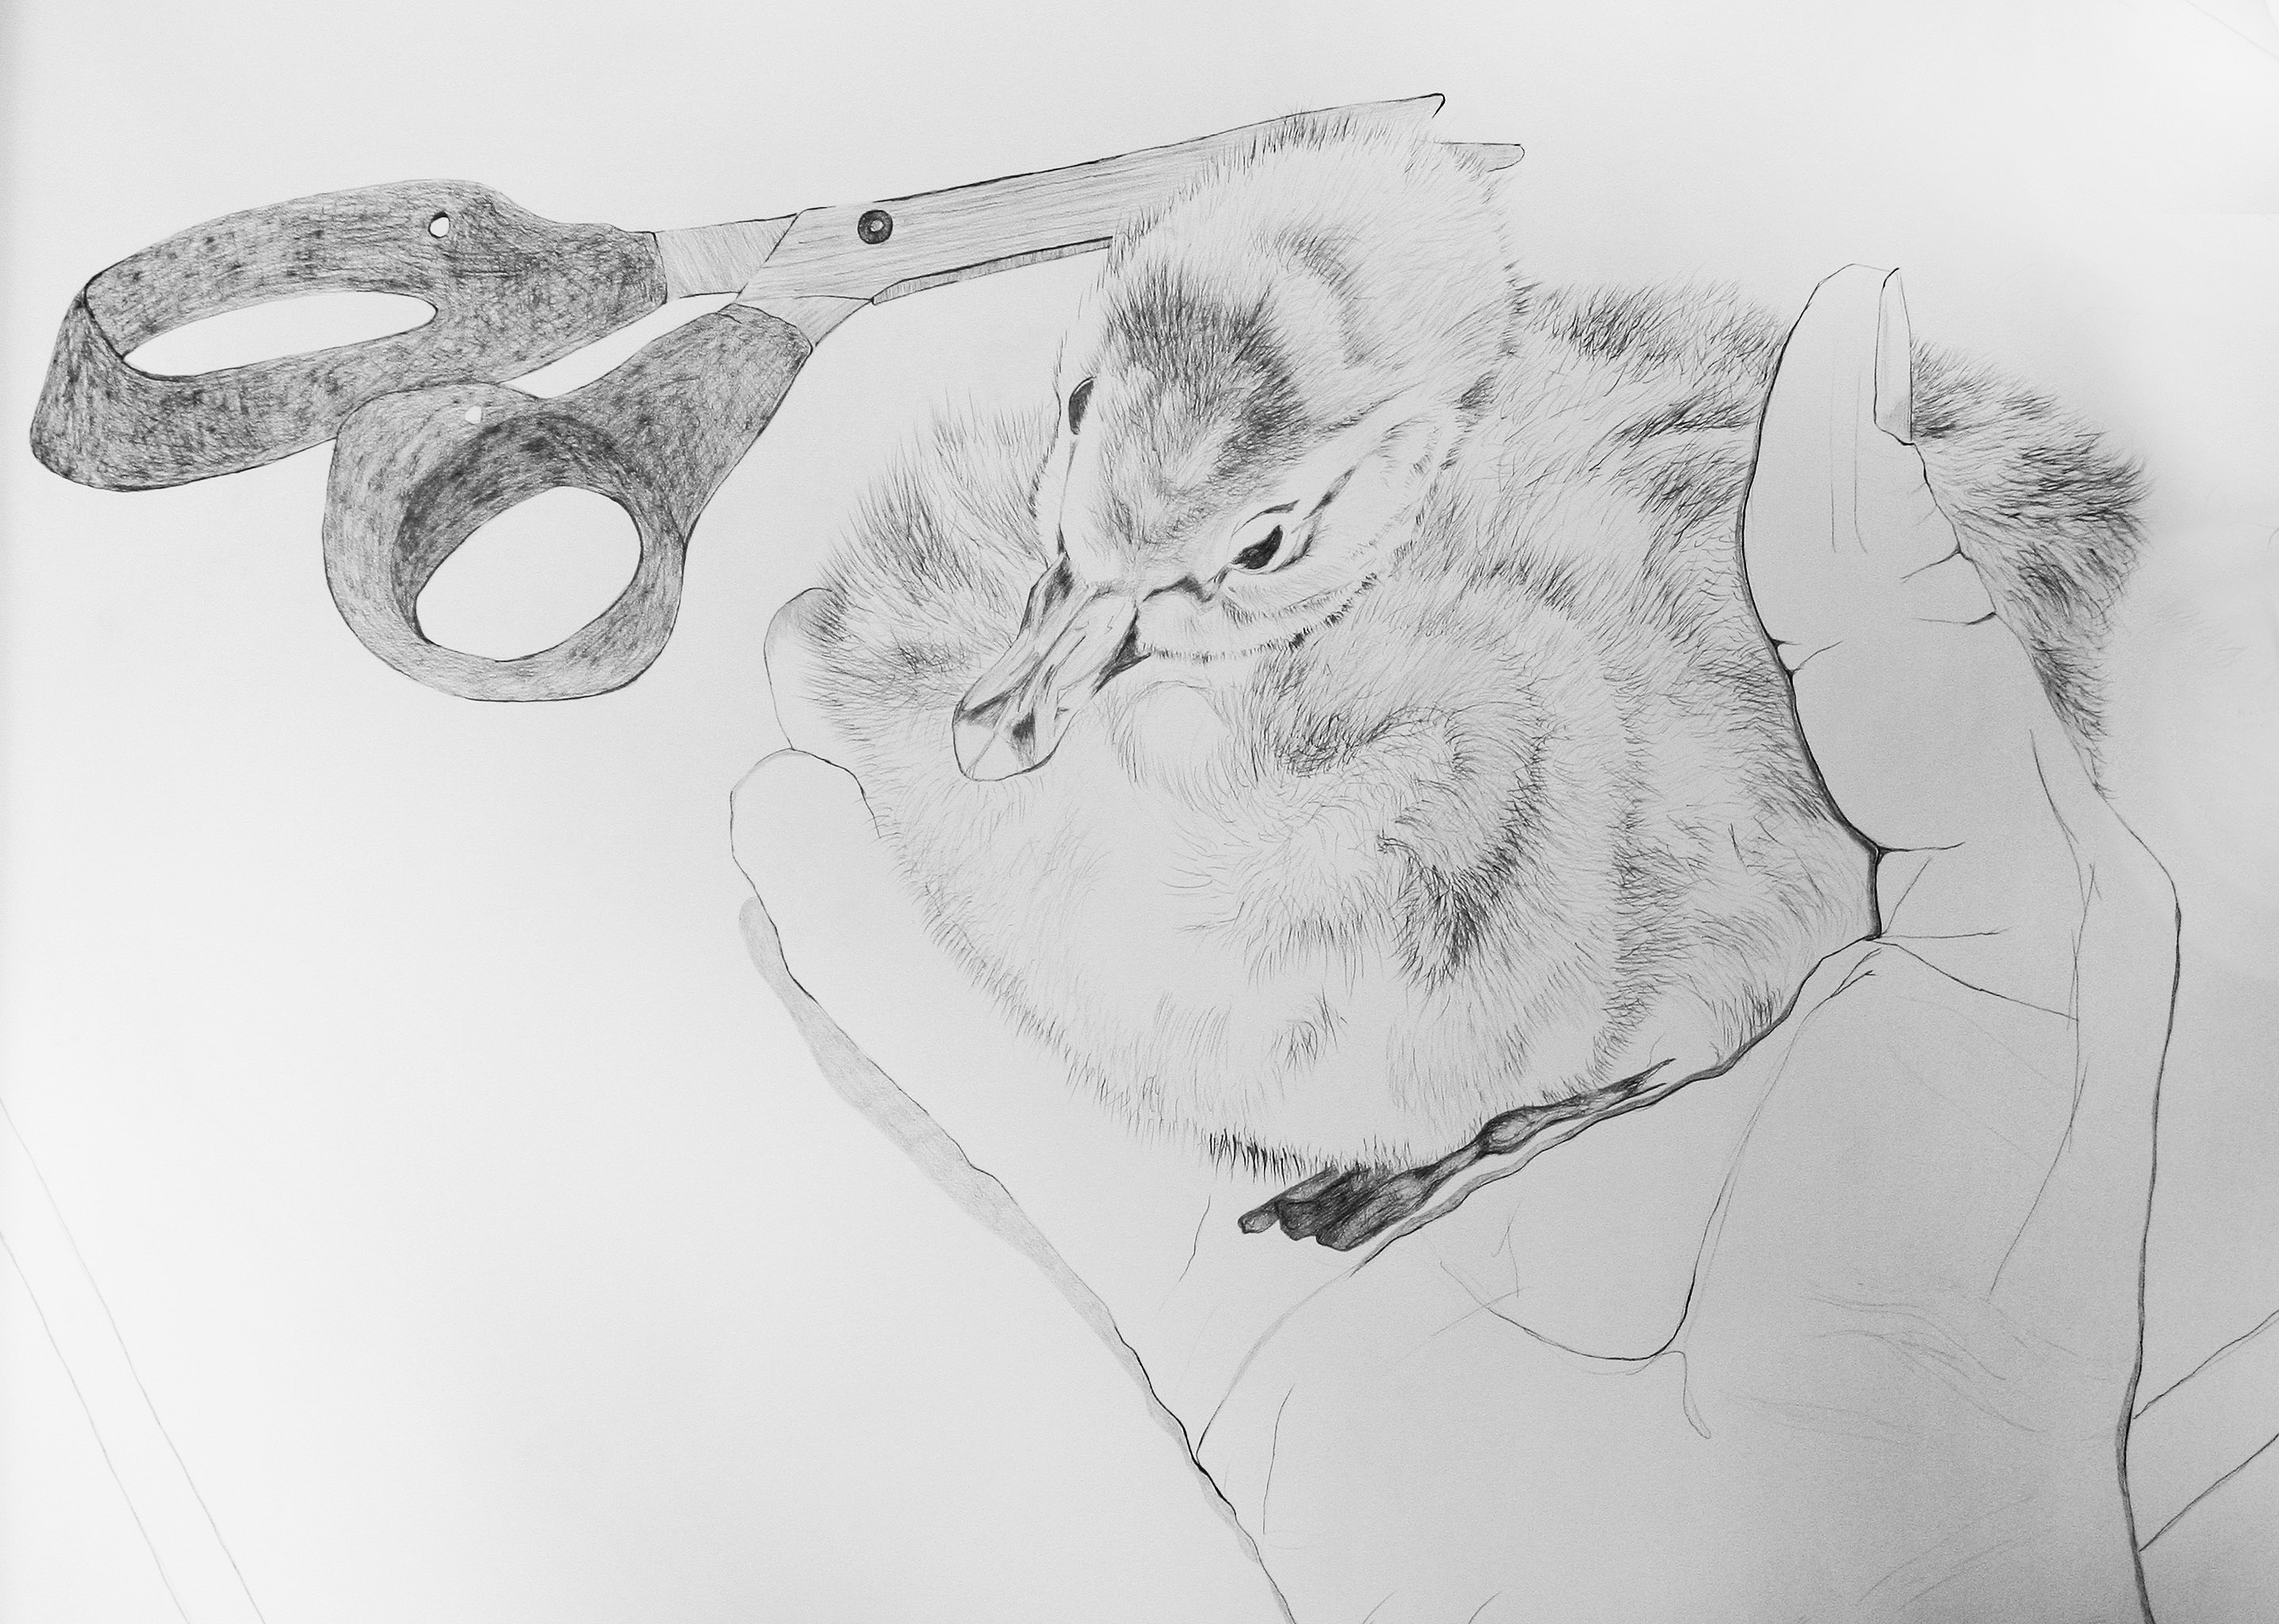 drawing_6.jpg